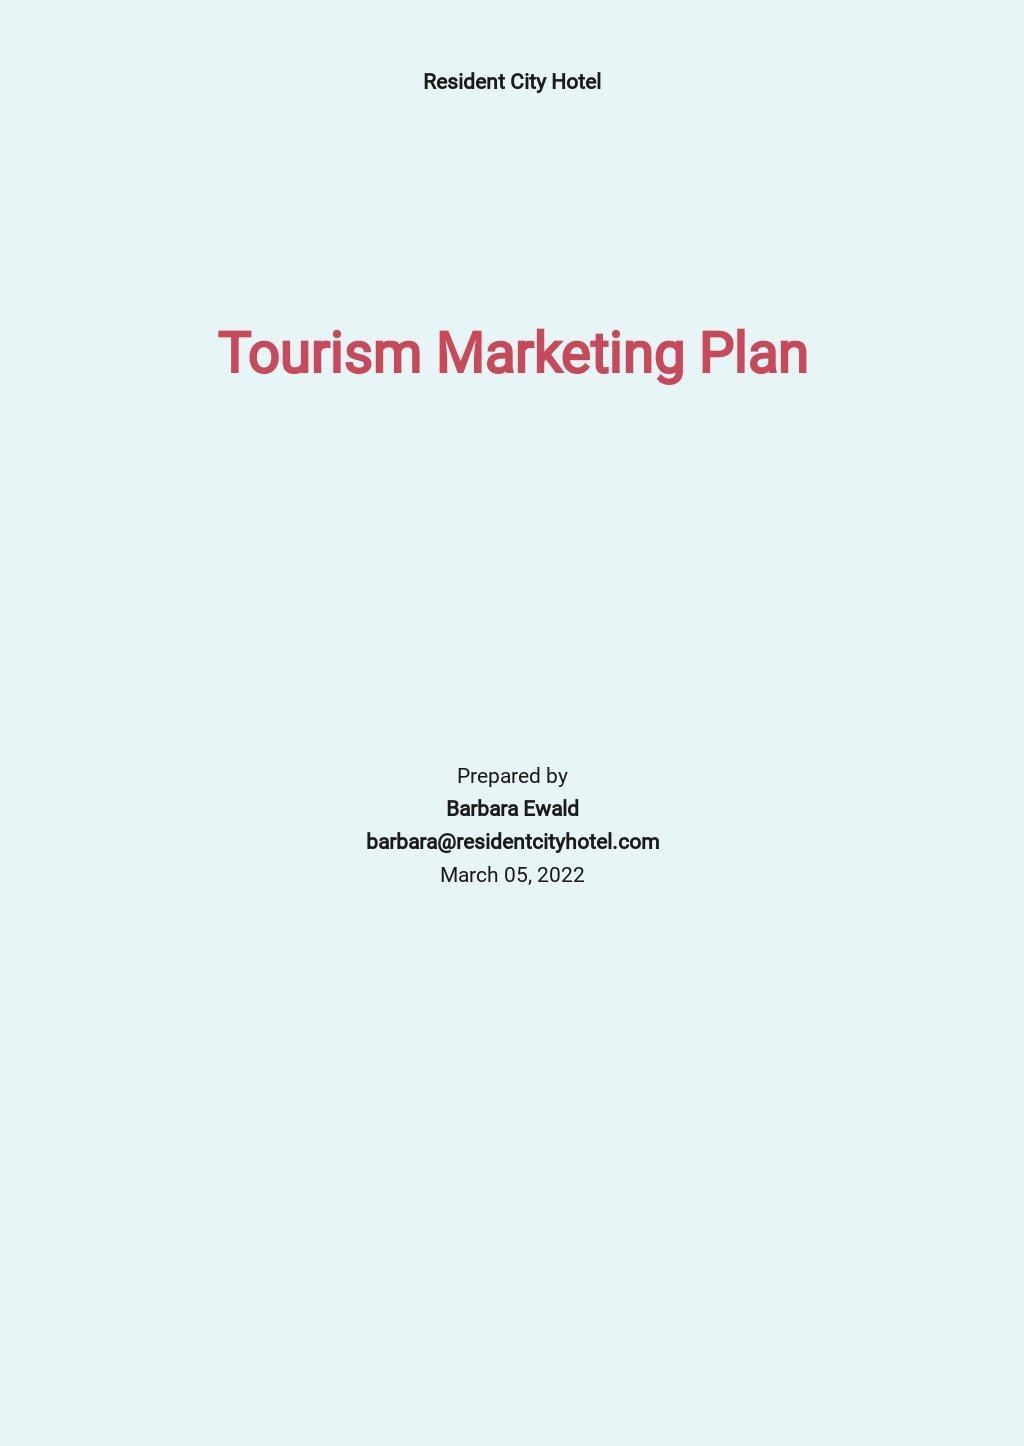 Tourism Marketing Plan Template.jpe